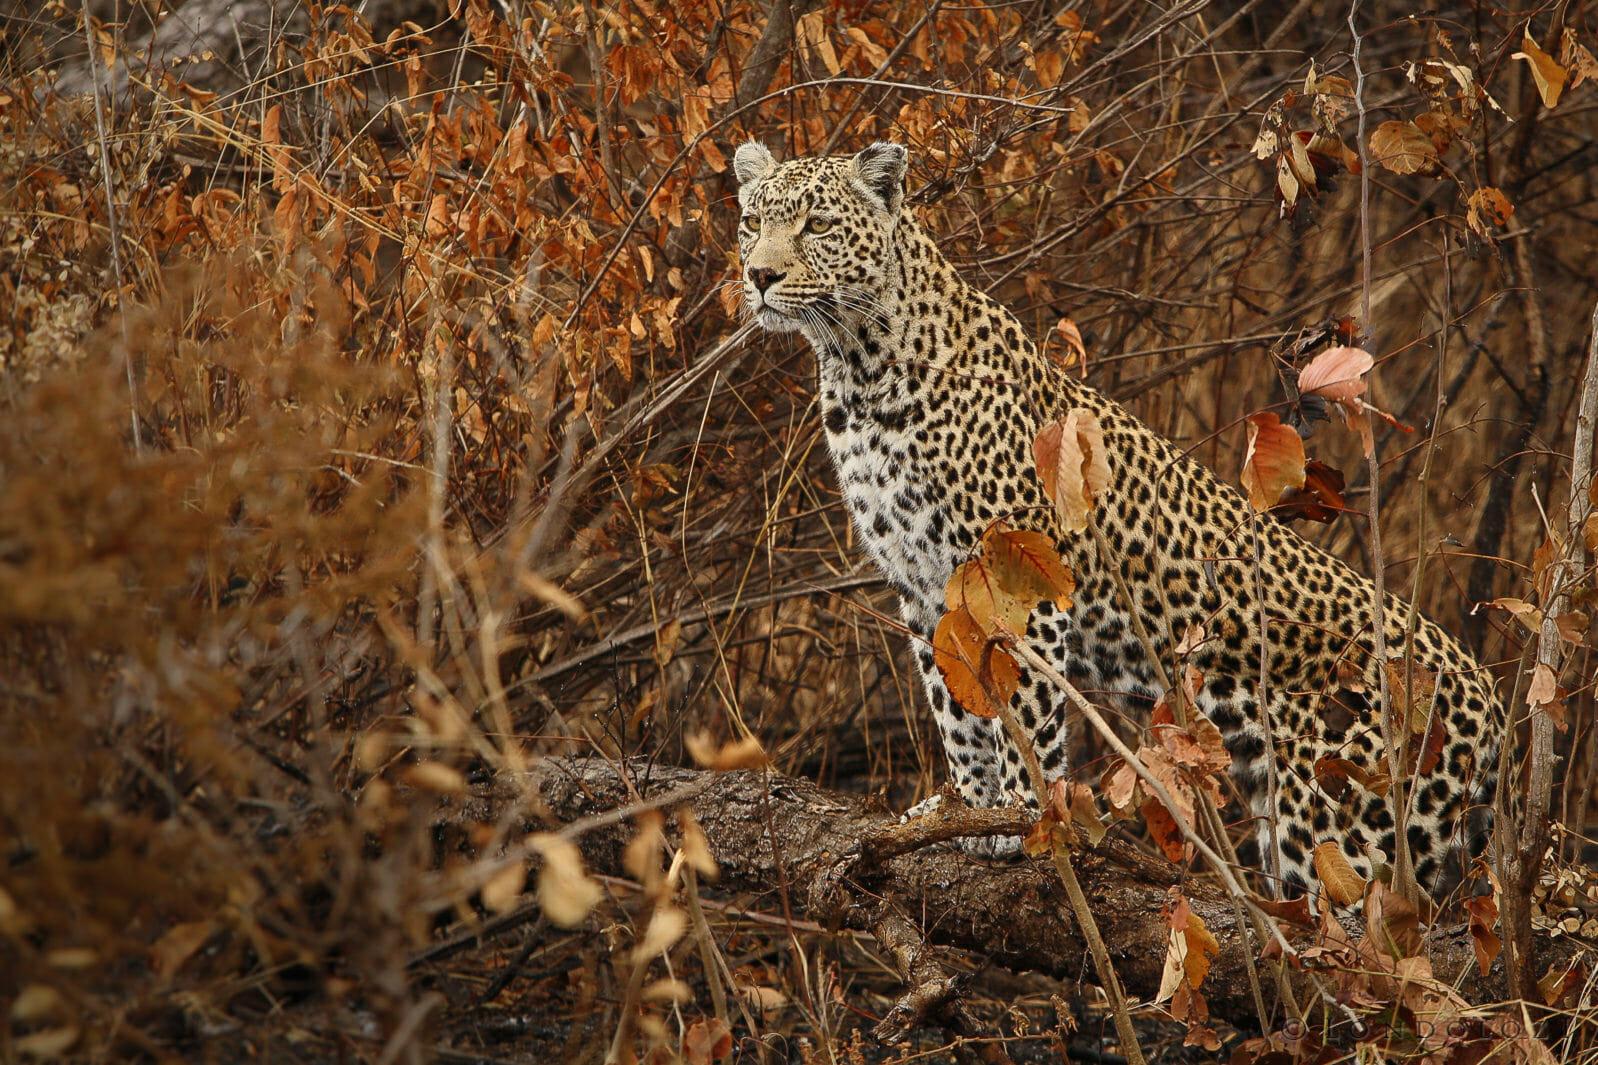 Nottens Female Leopard Jt